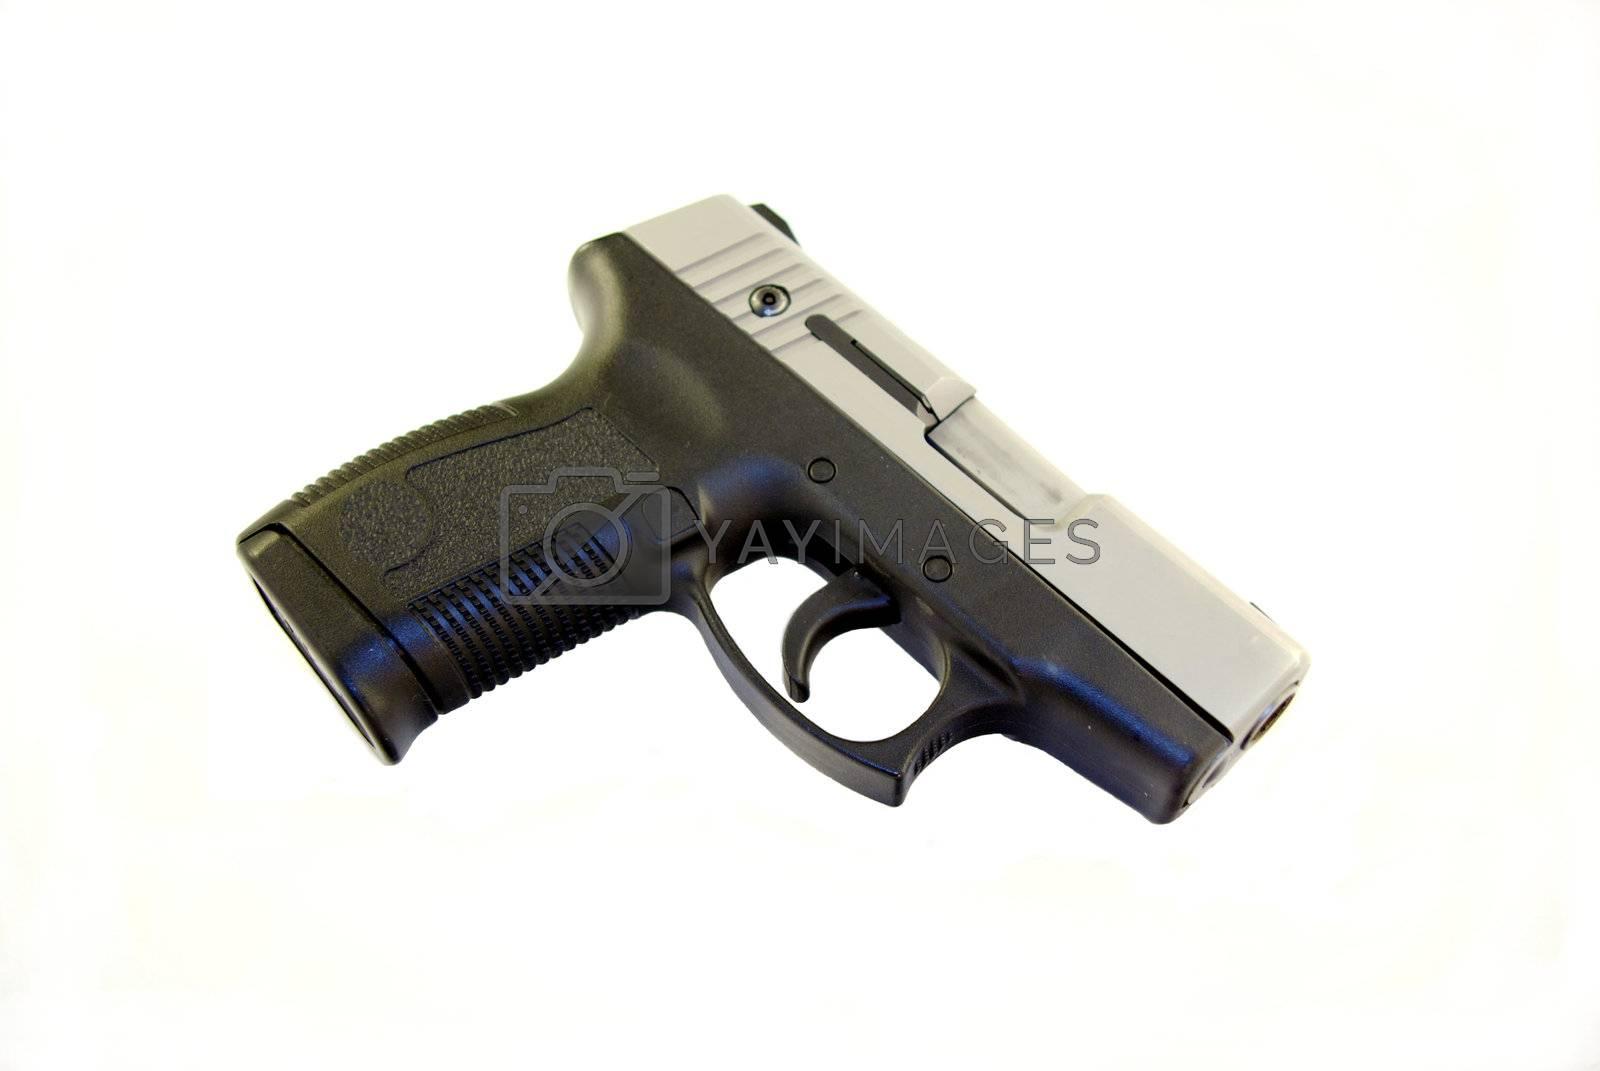 Semi Auto Pistol by bendicks